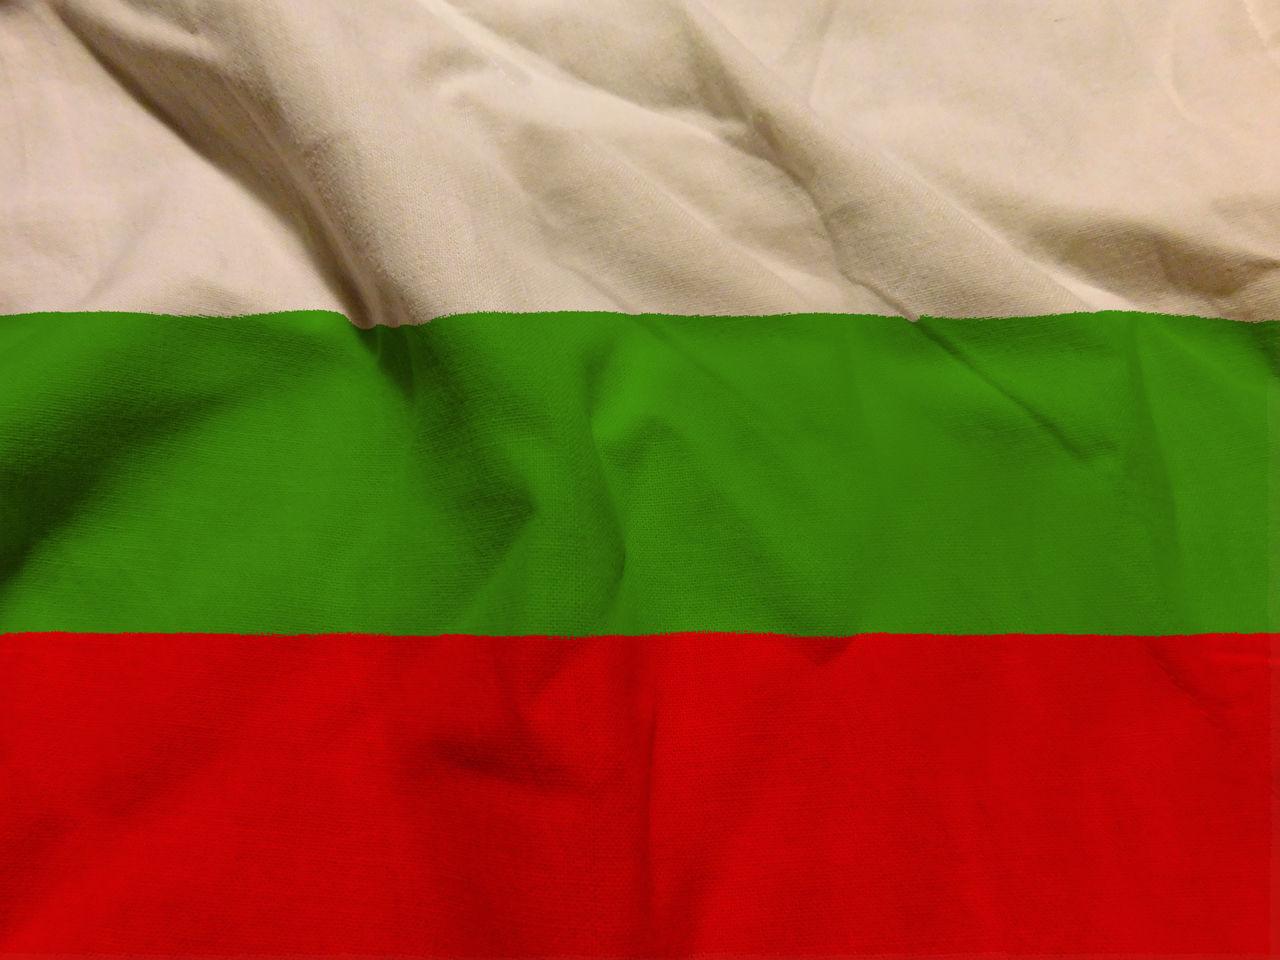 textile, red, green color, full frame, indoors, bed, no people, flag, close-up, linen, furniture, backgrounds, sheet, patriotism, crumpled, still life, pattern, white color